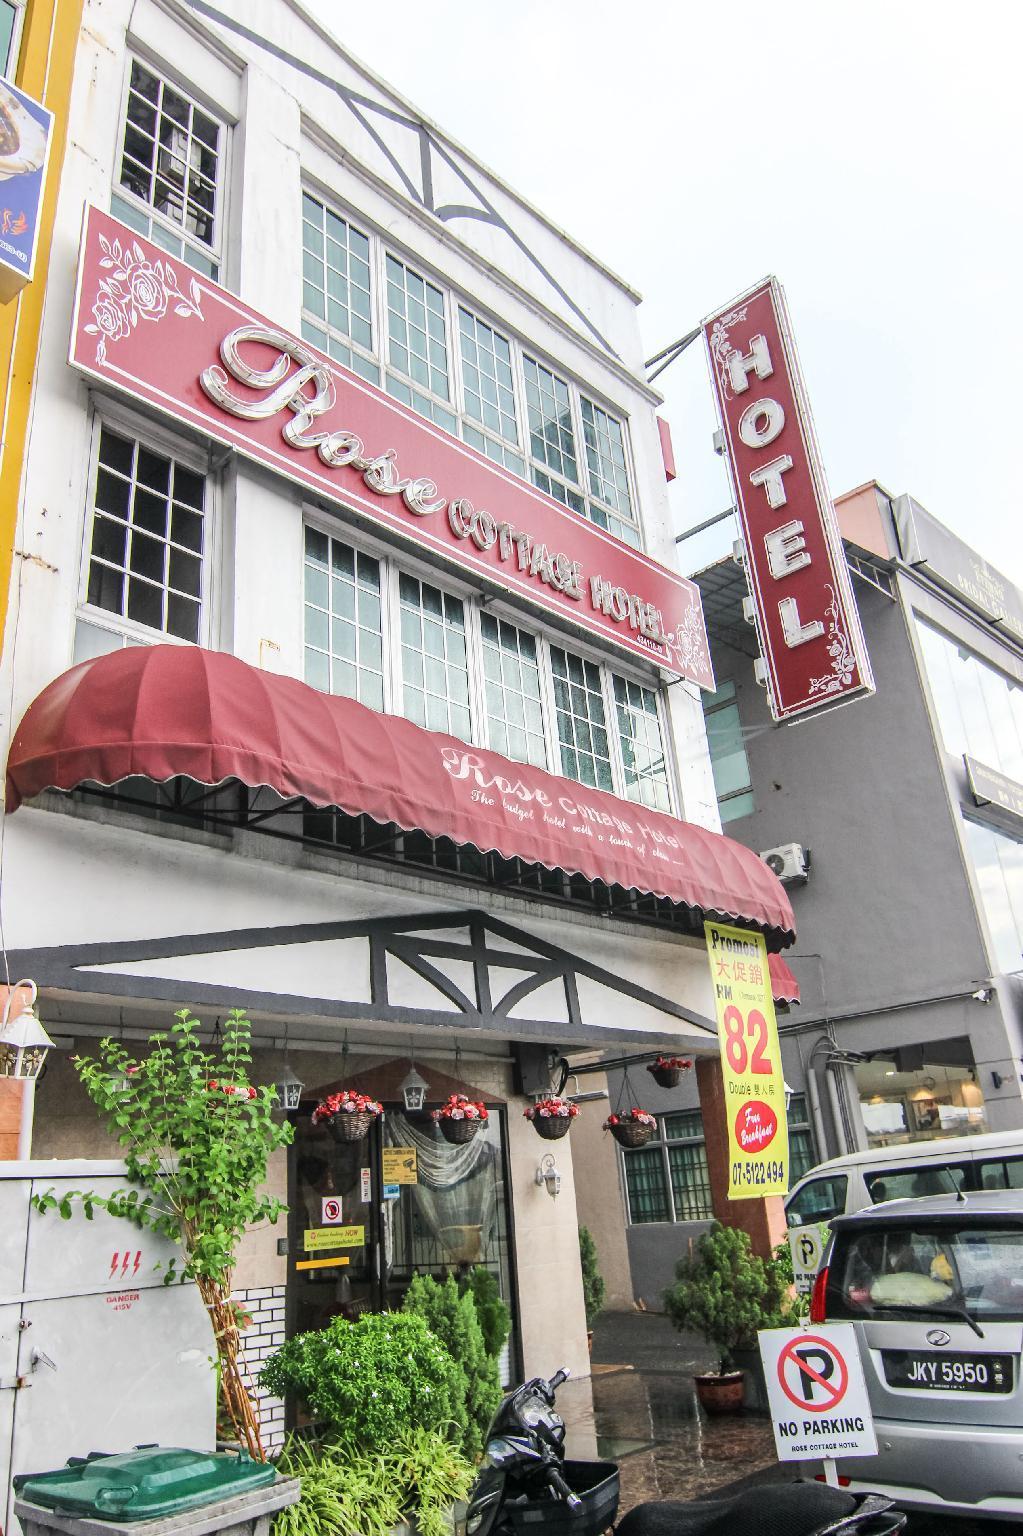 Rose Cottage Hotel Taman Nusa Bestari 2, Johor Bahru